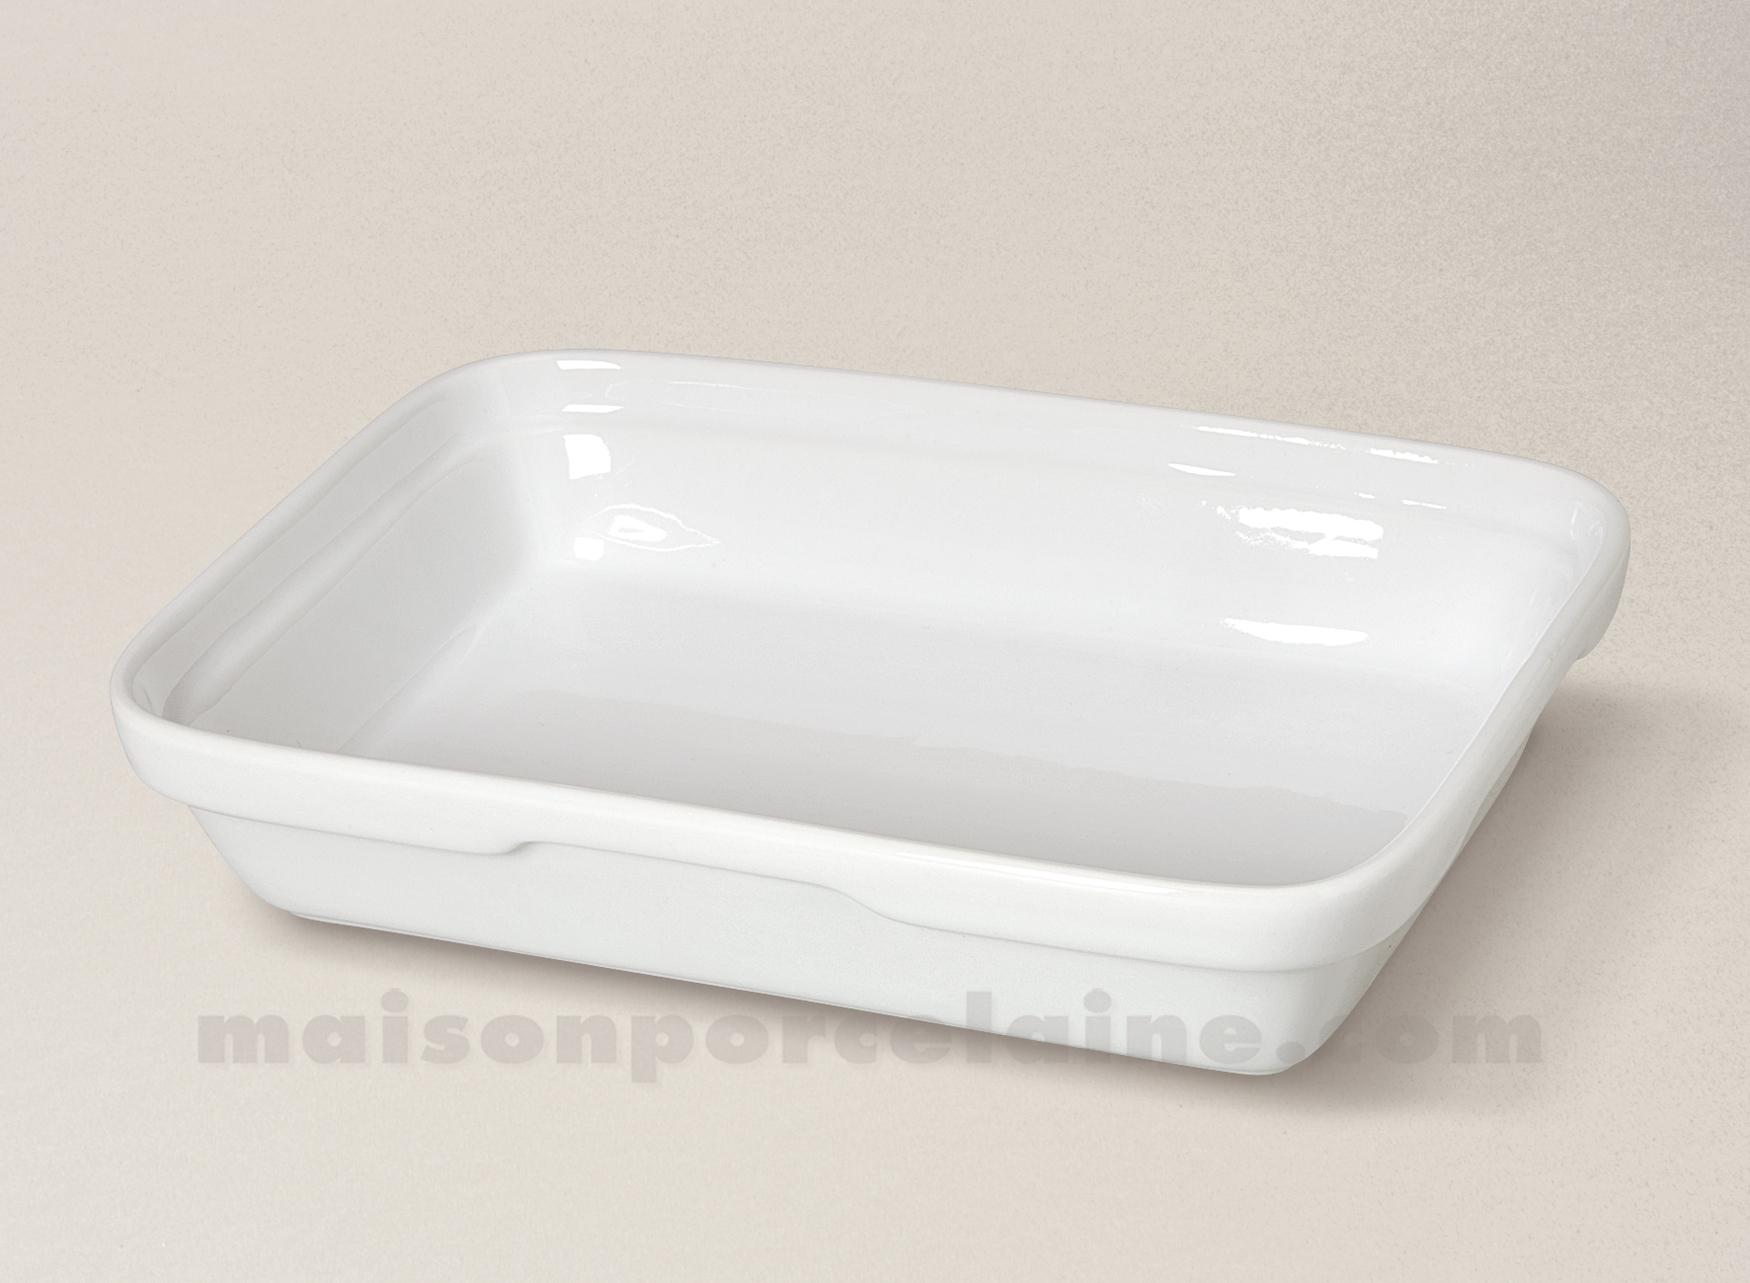 plat four rectangulaire empilable porcelaine blanche chr. Black Bedroom Furniture Sets. Home Design Ideas